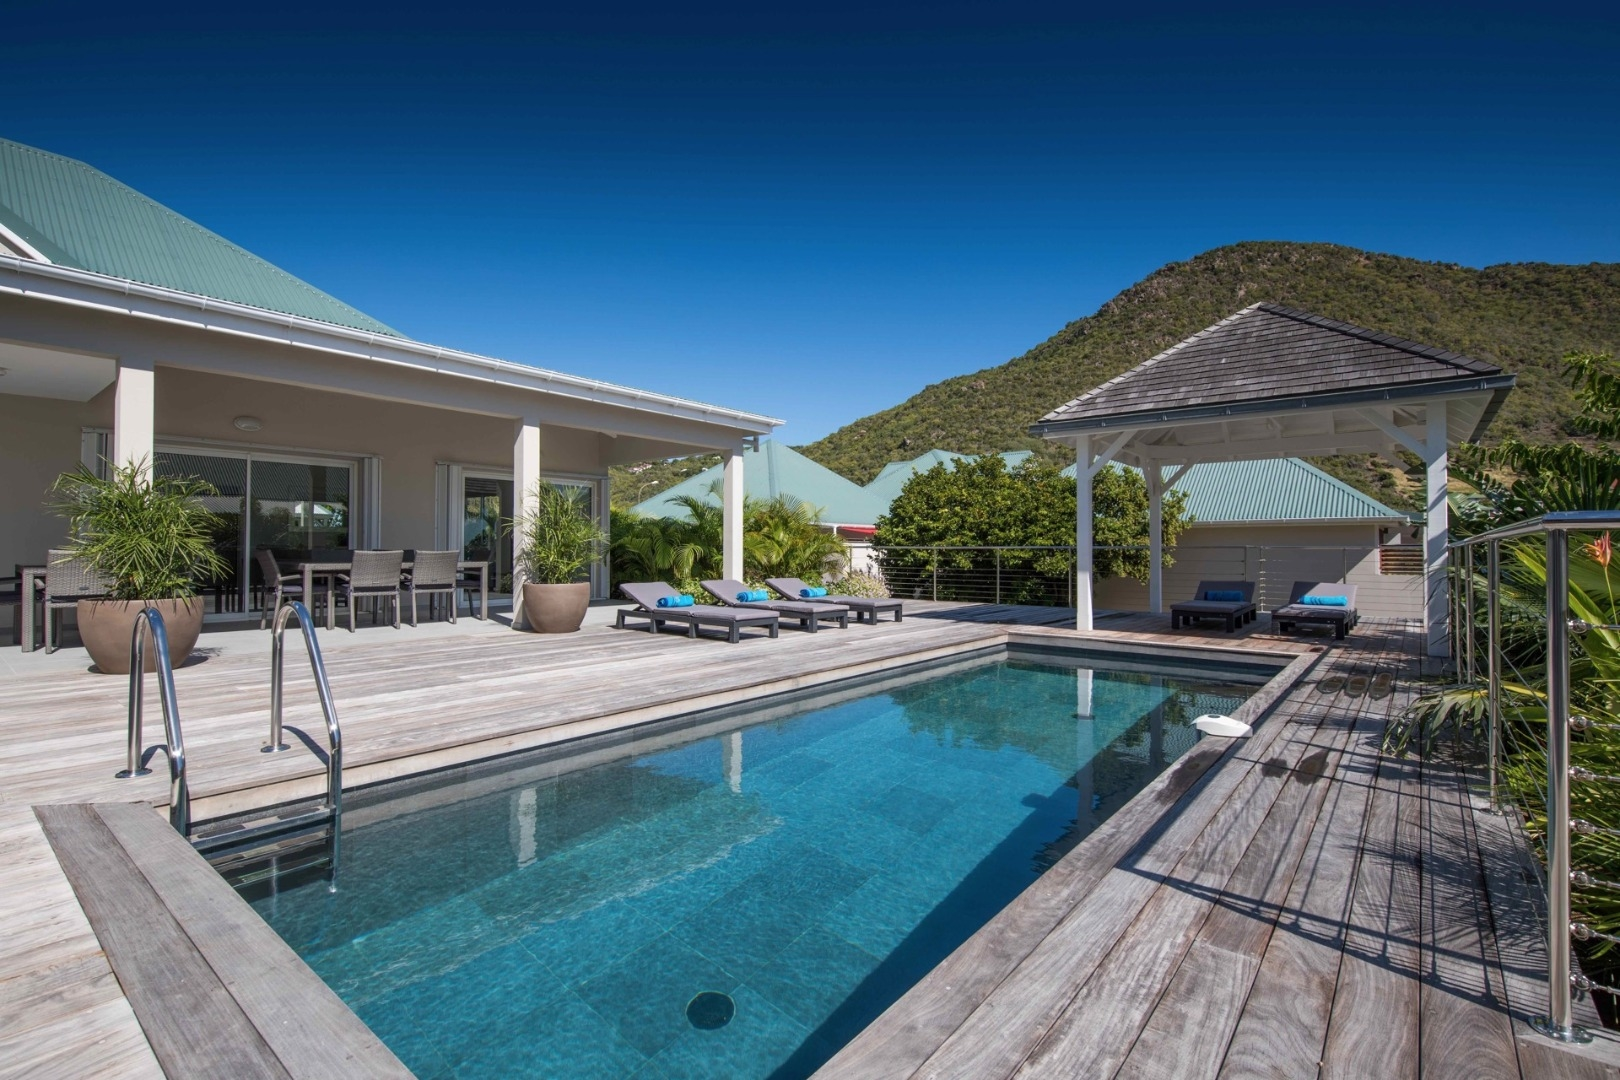 Luxury villa rentals caribbean - St barthelemy - Grand fond - No location 4 - Wild Blue - Image 1/25